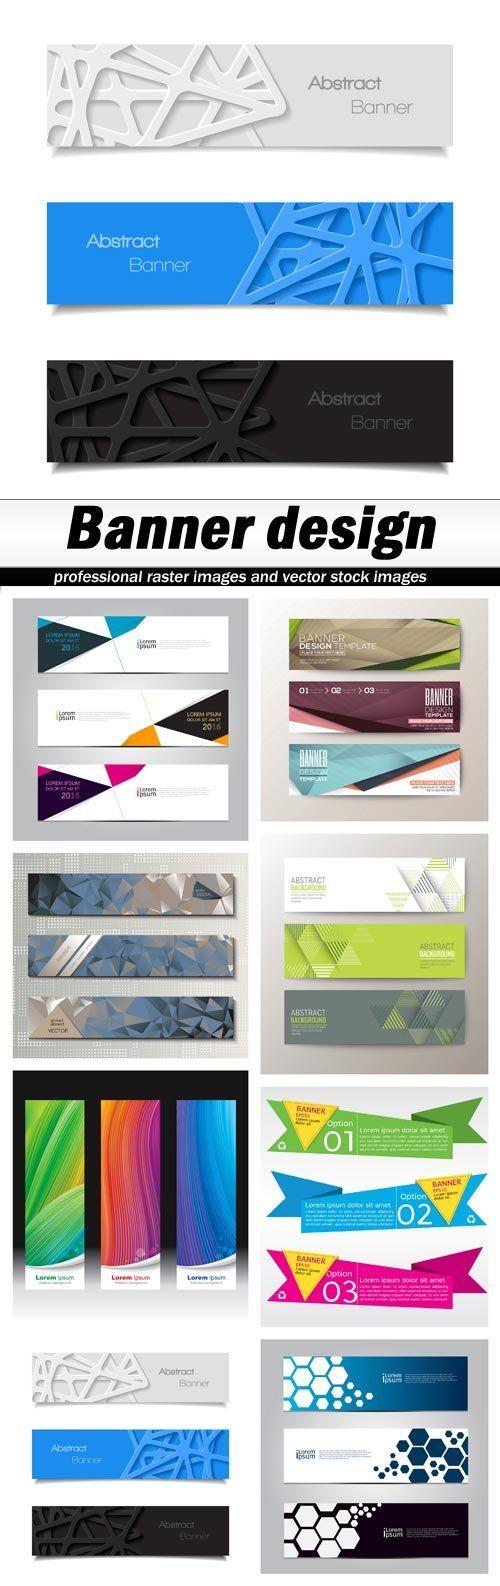 Banner design - 8 EPS